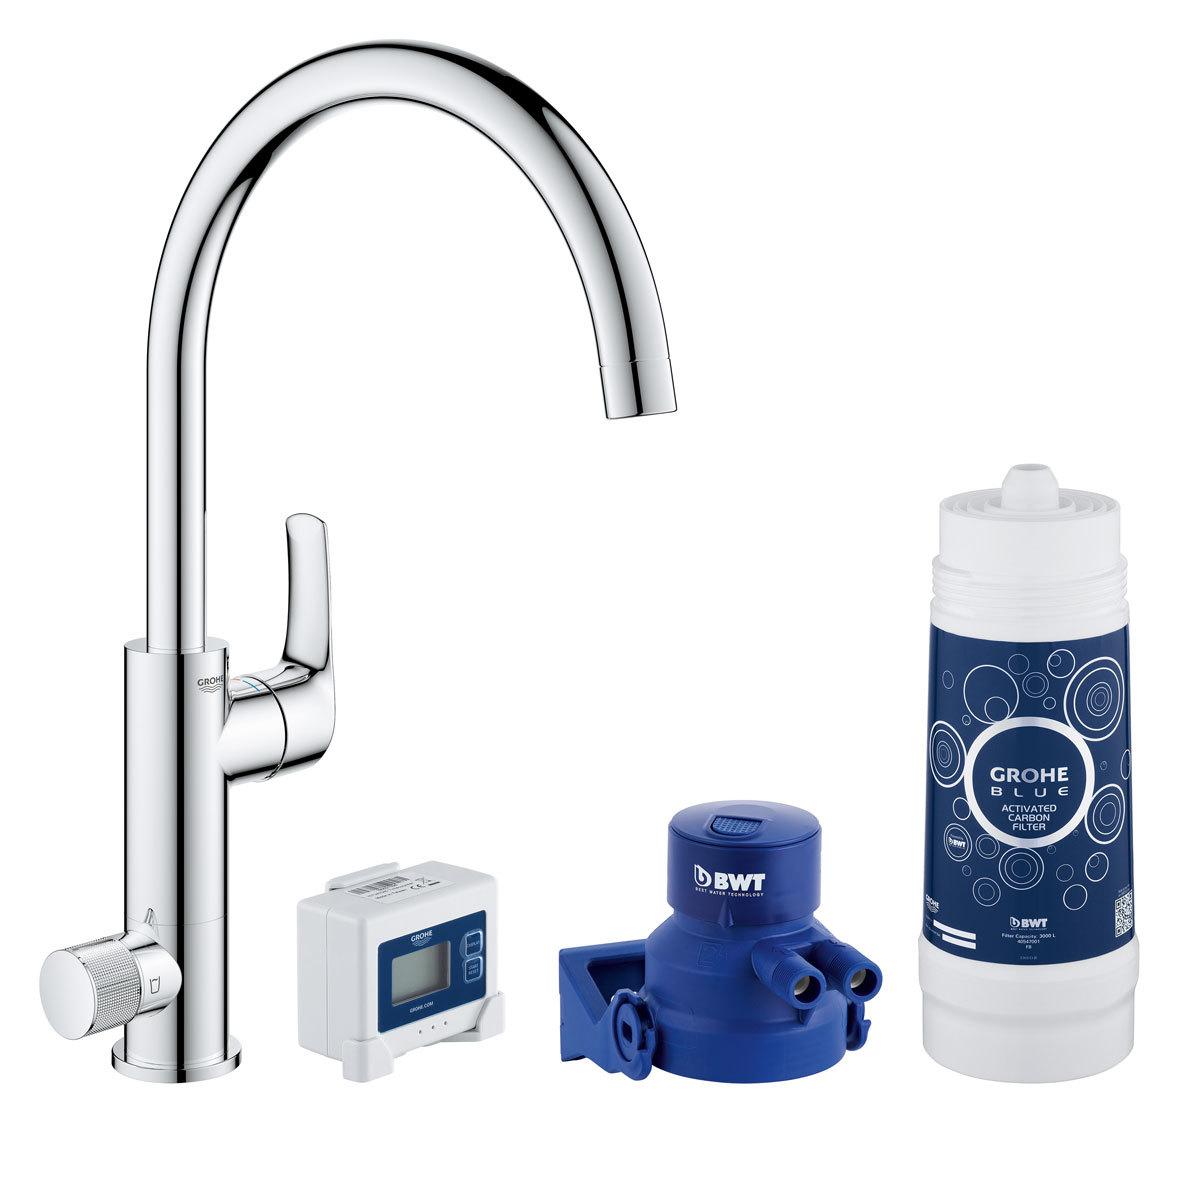 4-metodi-infallabili-per-purificare-acqua-di-casa-11